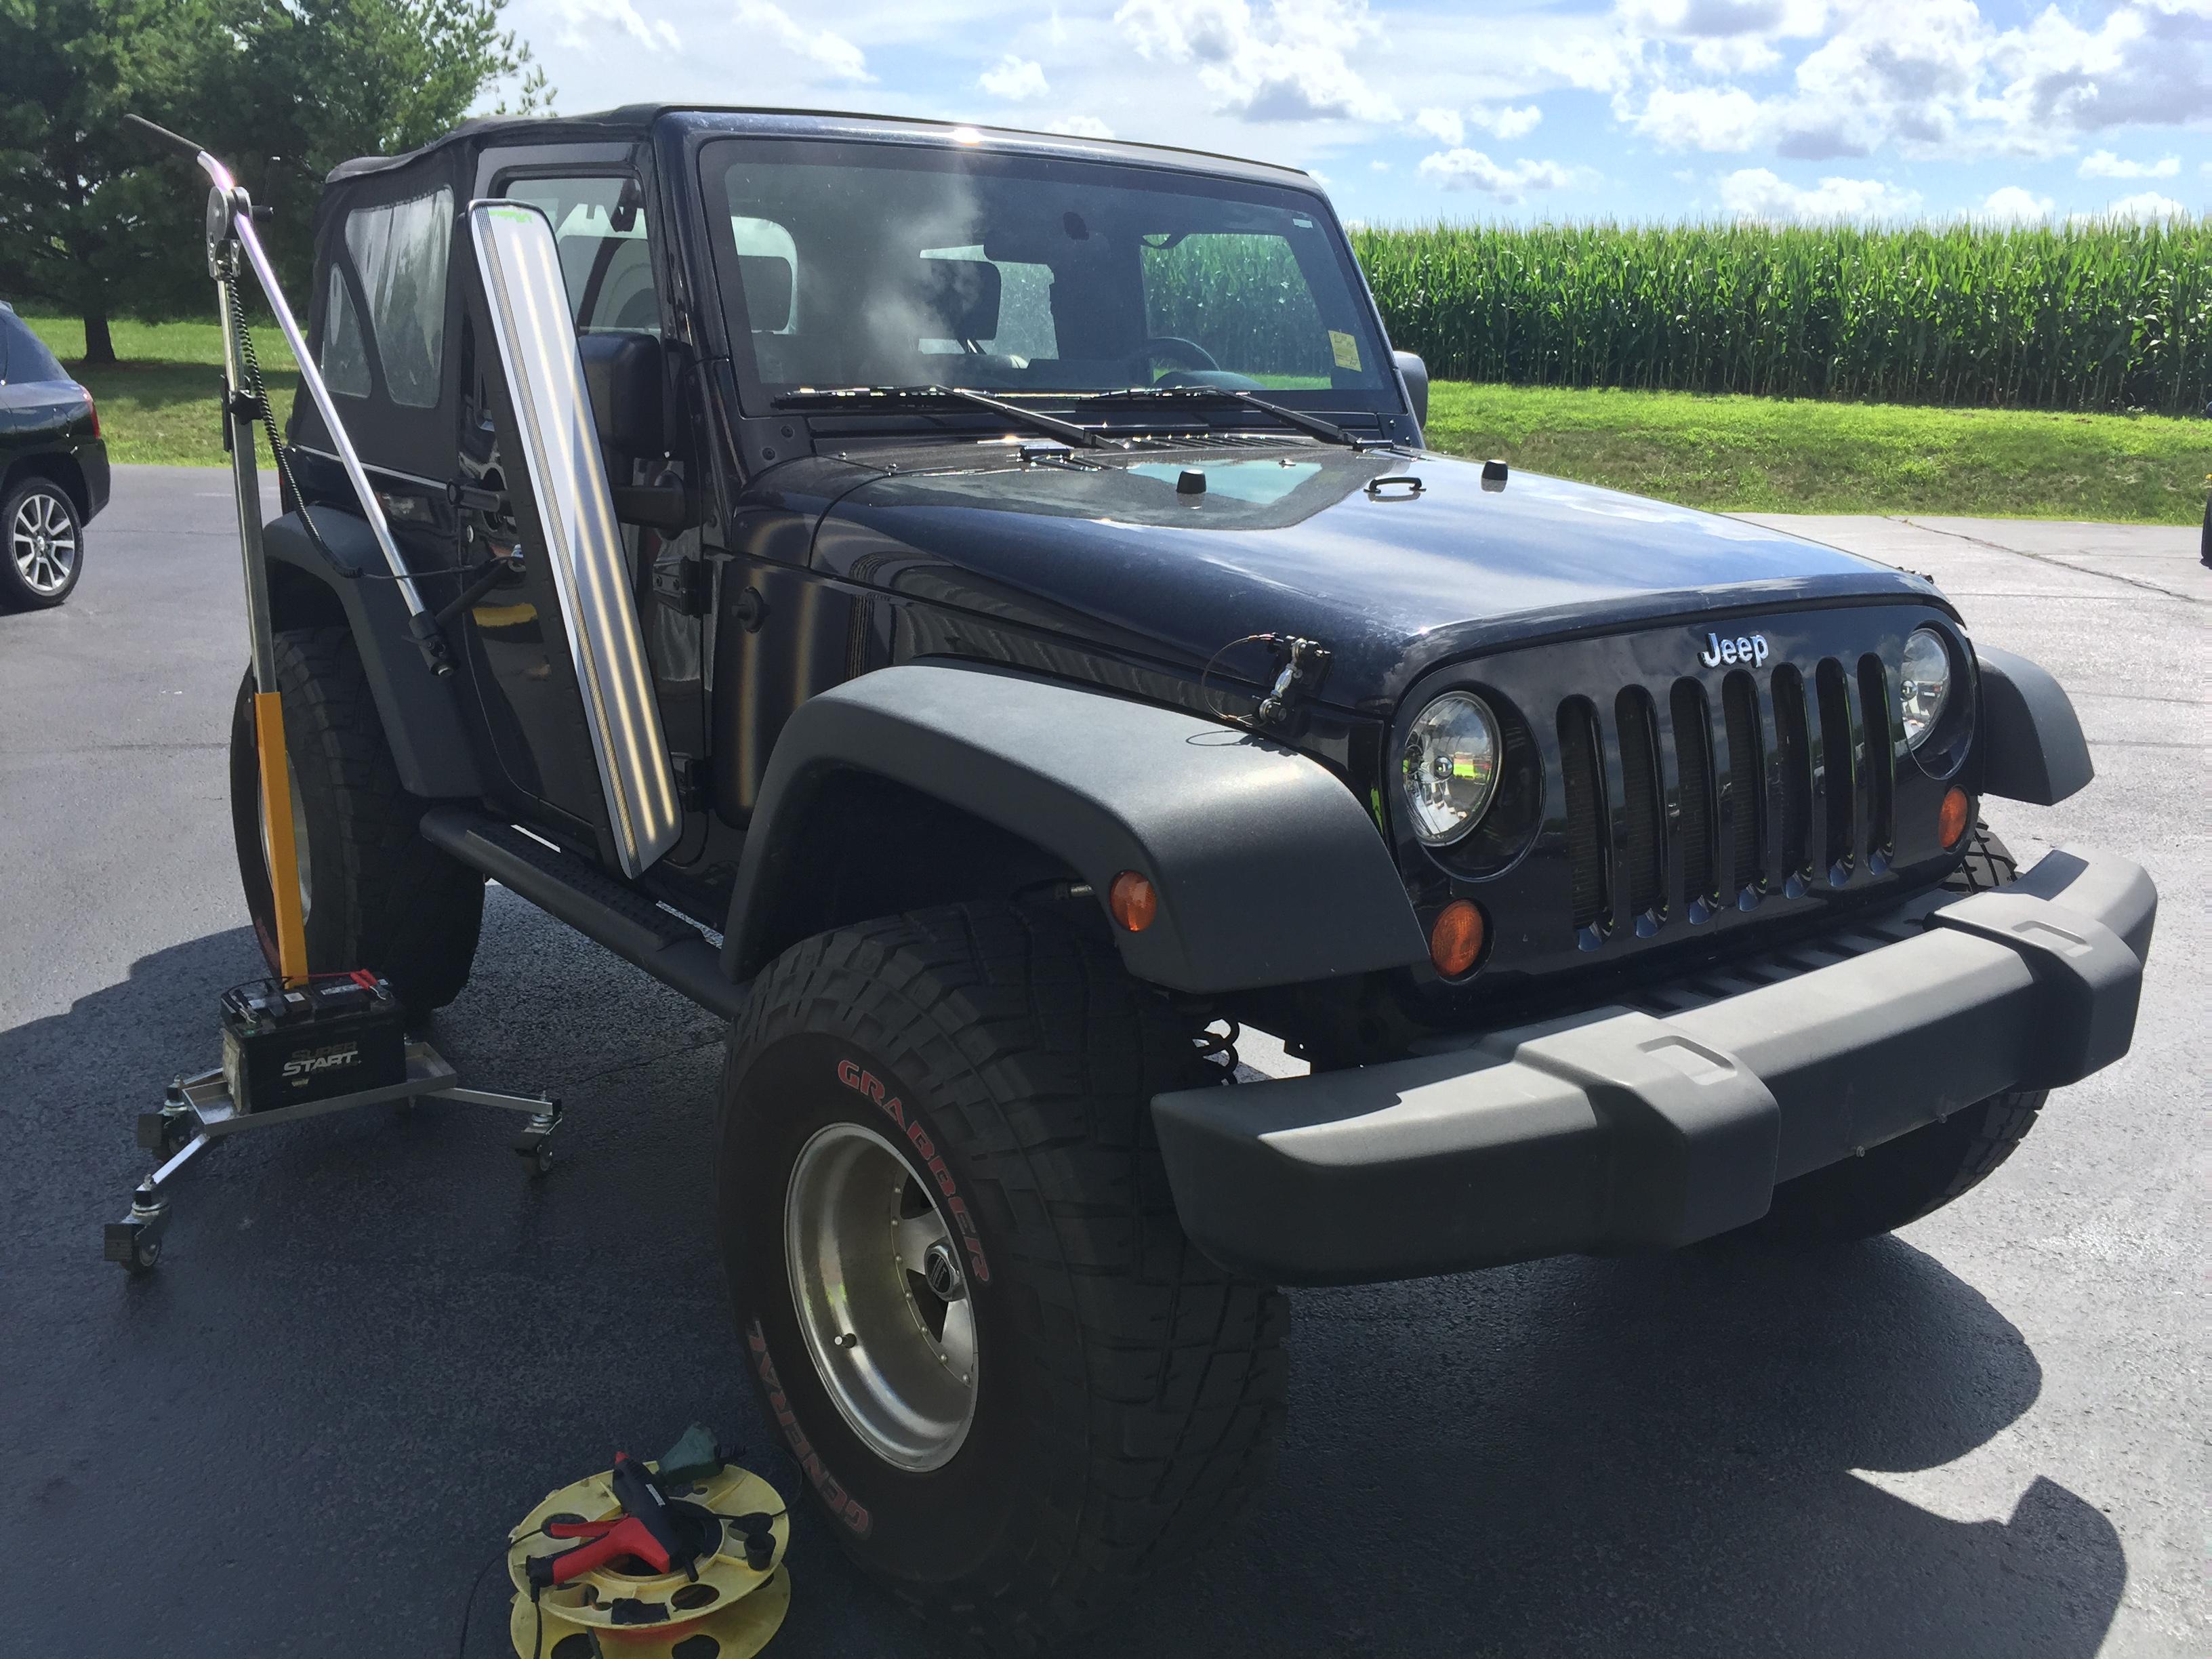 2008 Jeep Wrangler Dent Repair, Springfield, IL, http://217dent.com